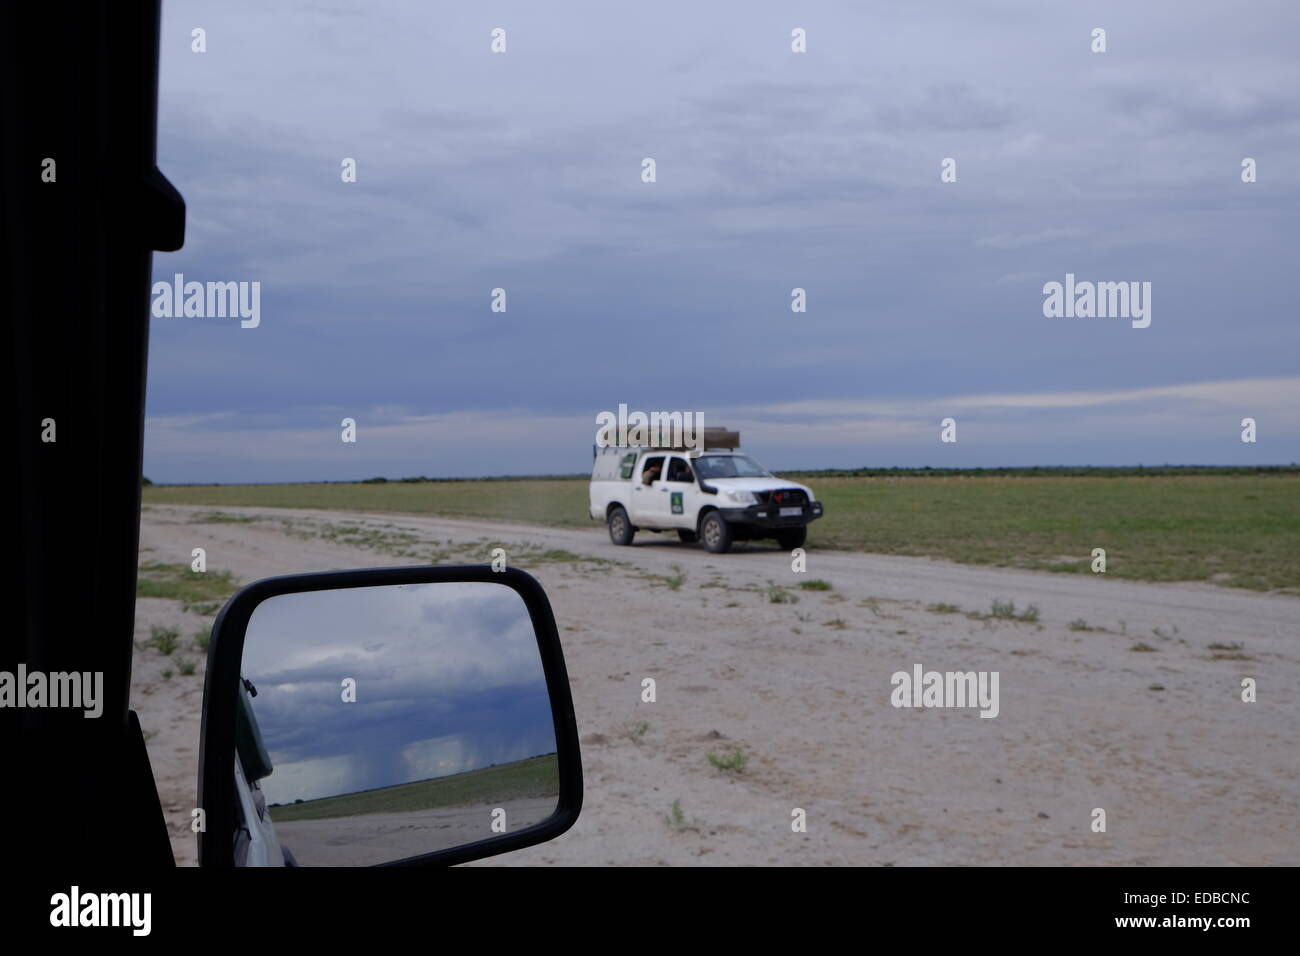 Two 4 wheel drive vehicles game viewing in the Central Kalahari Botswana. - Stock Image